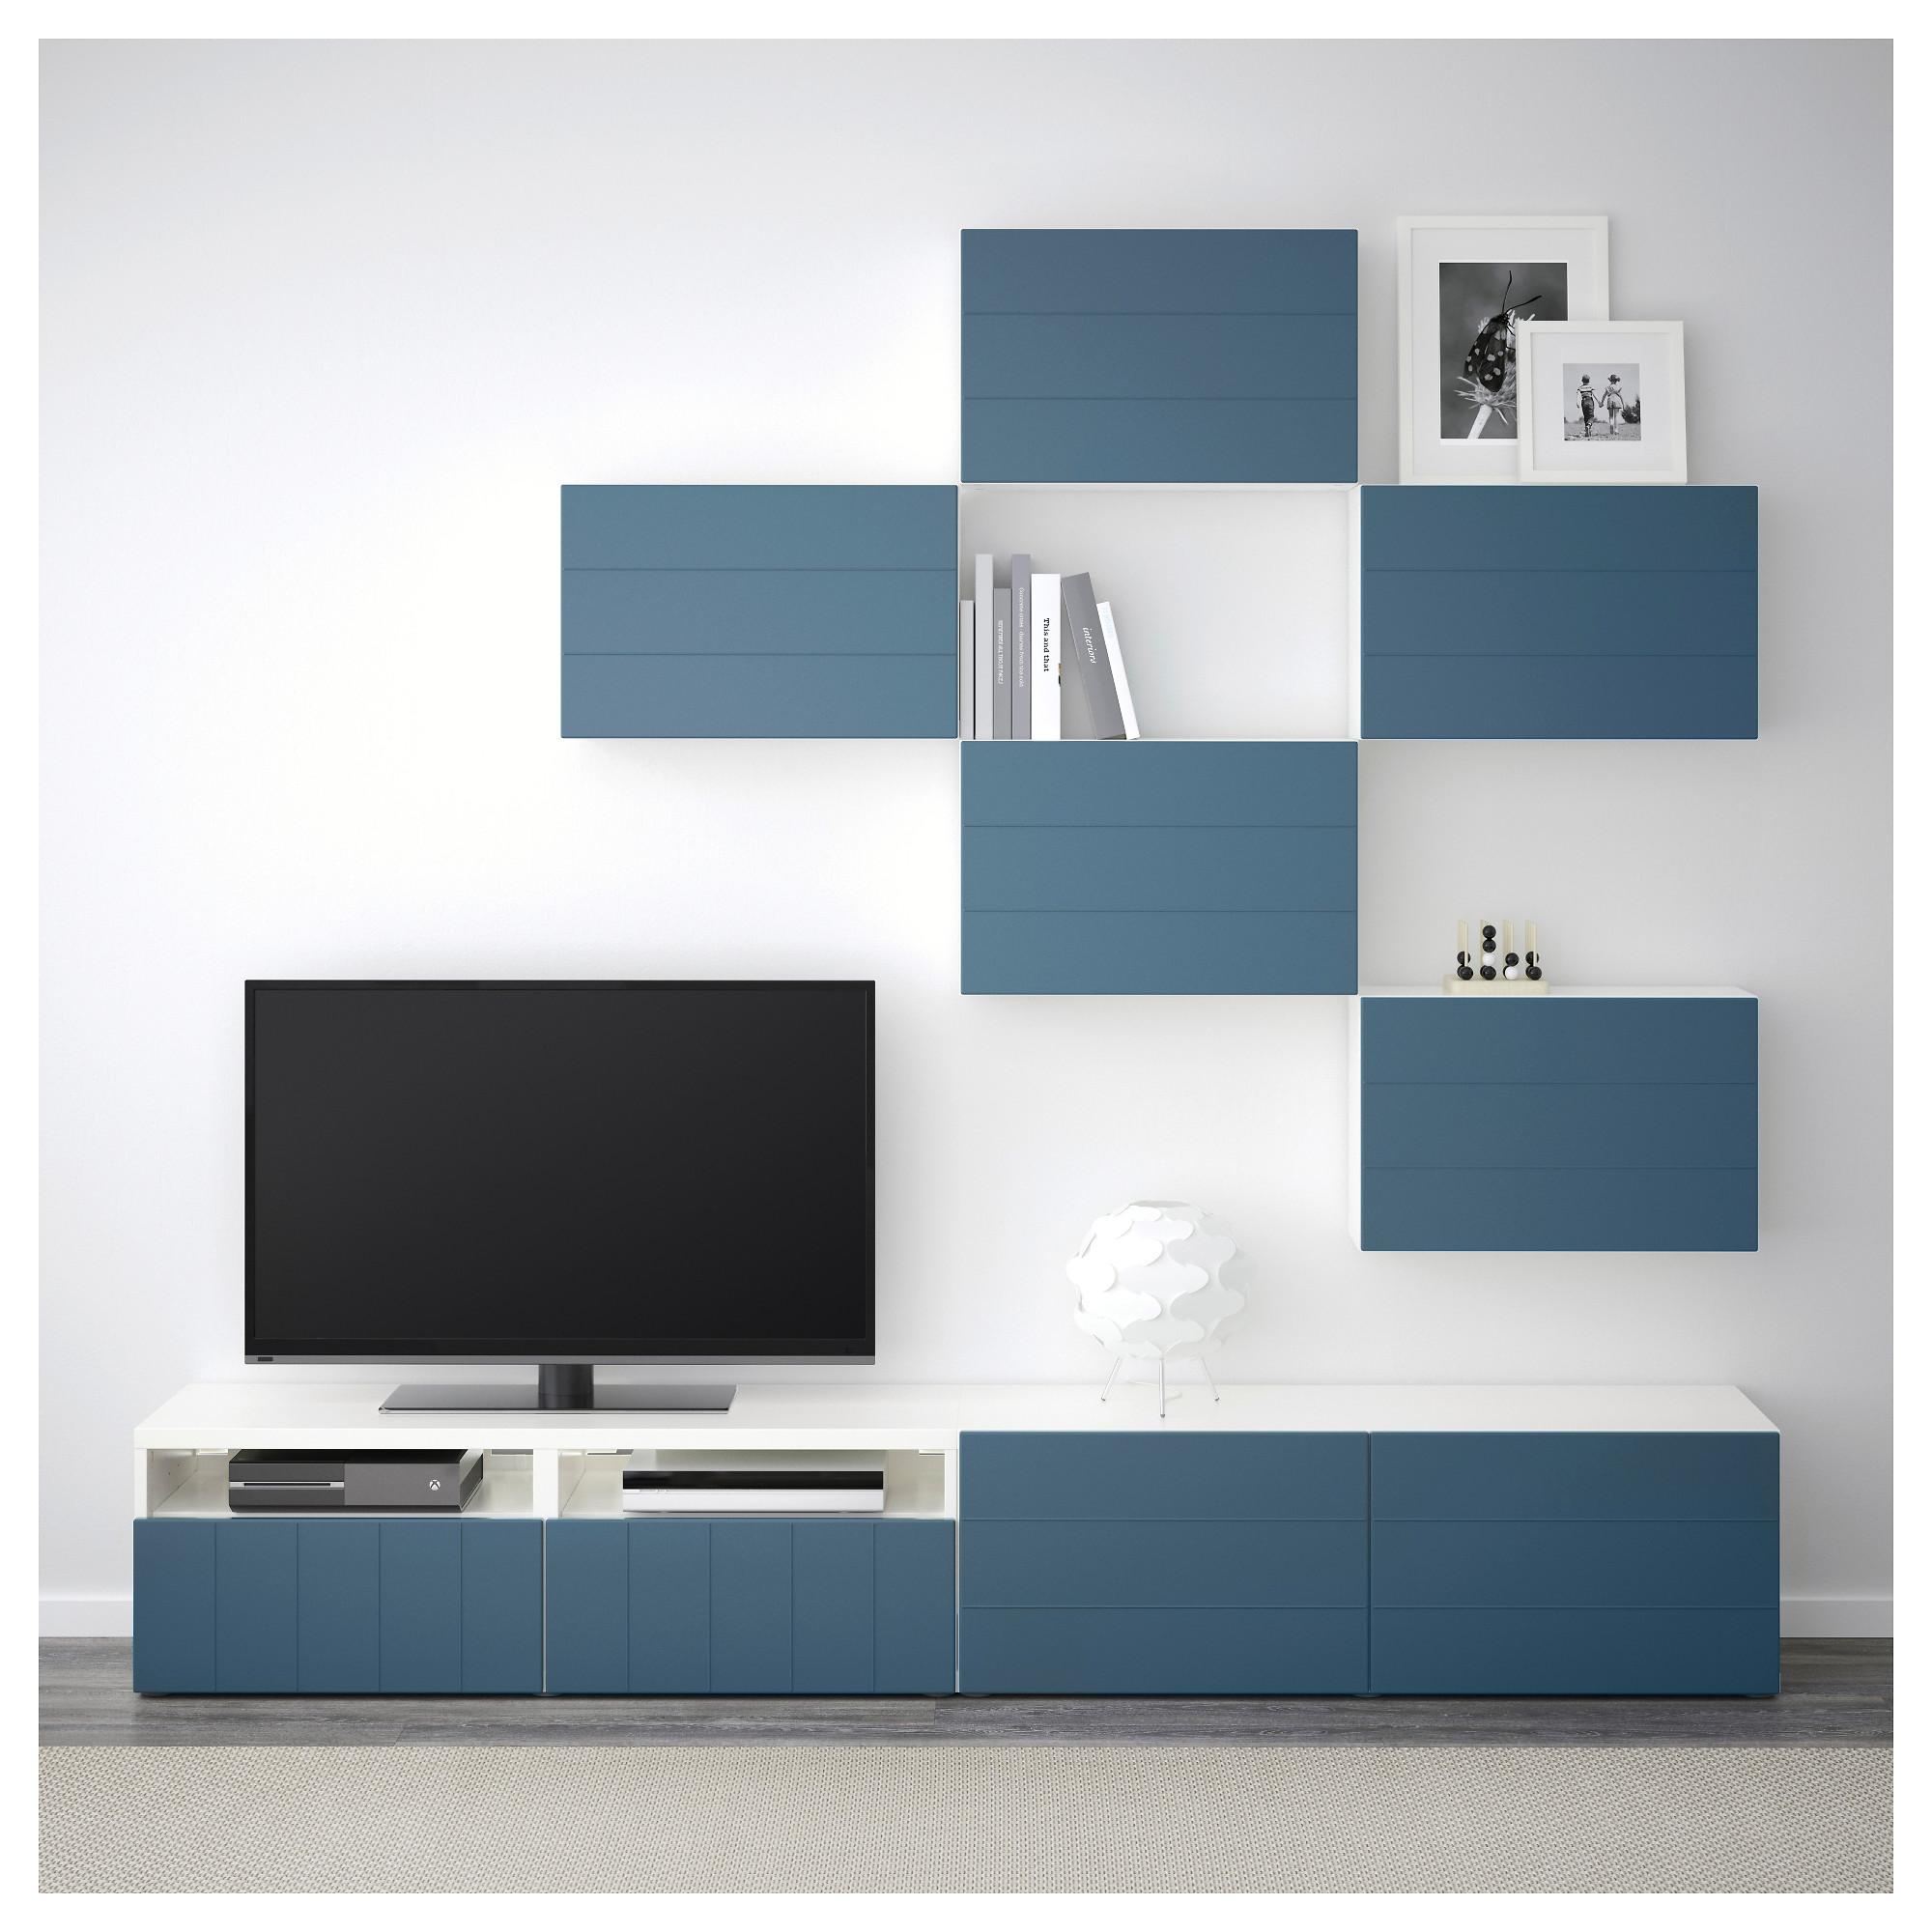 Шкаф для ТВ, комбинация БЕСТО темно-синий артикуль № 992.761.27 в наличии. Online каталог IKEA РБ. Недорогая доставка и соборка.